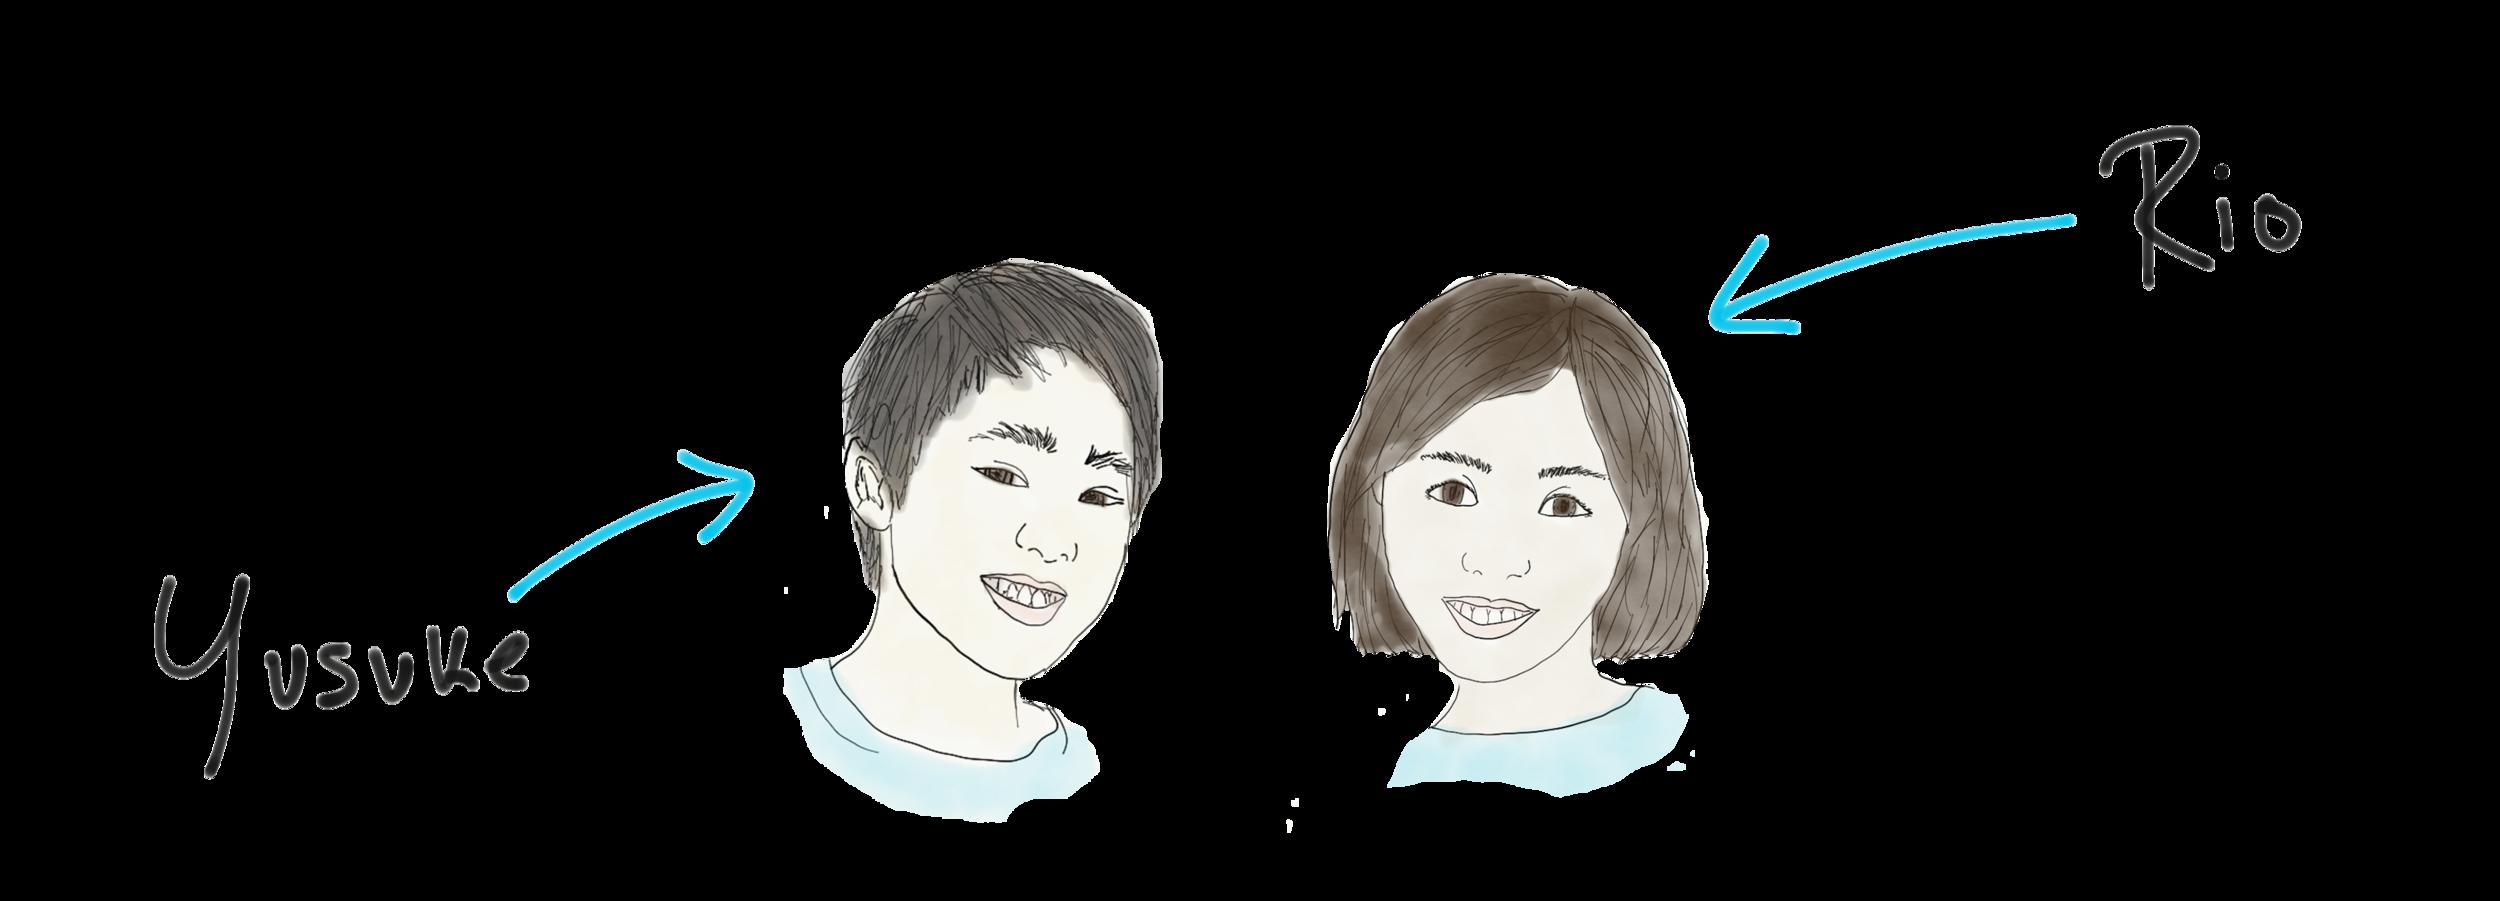 rio and yusuke-01.png